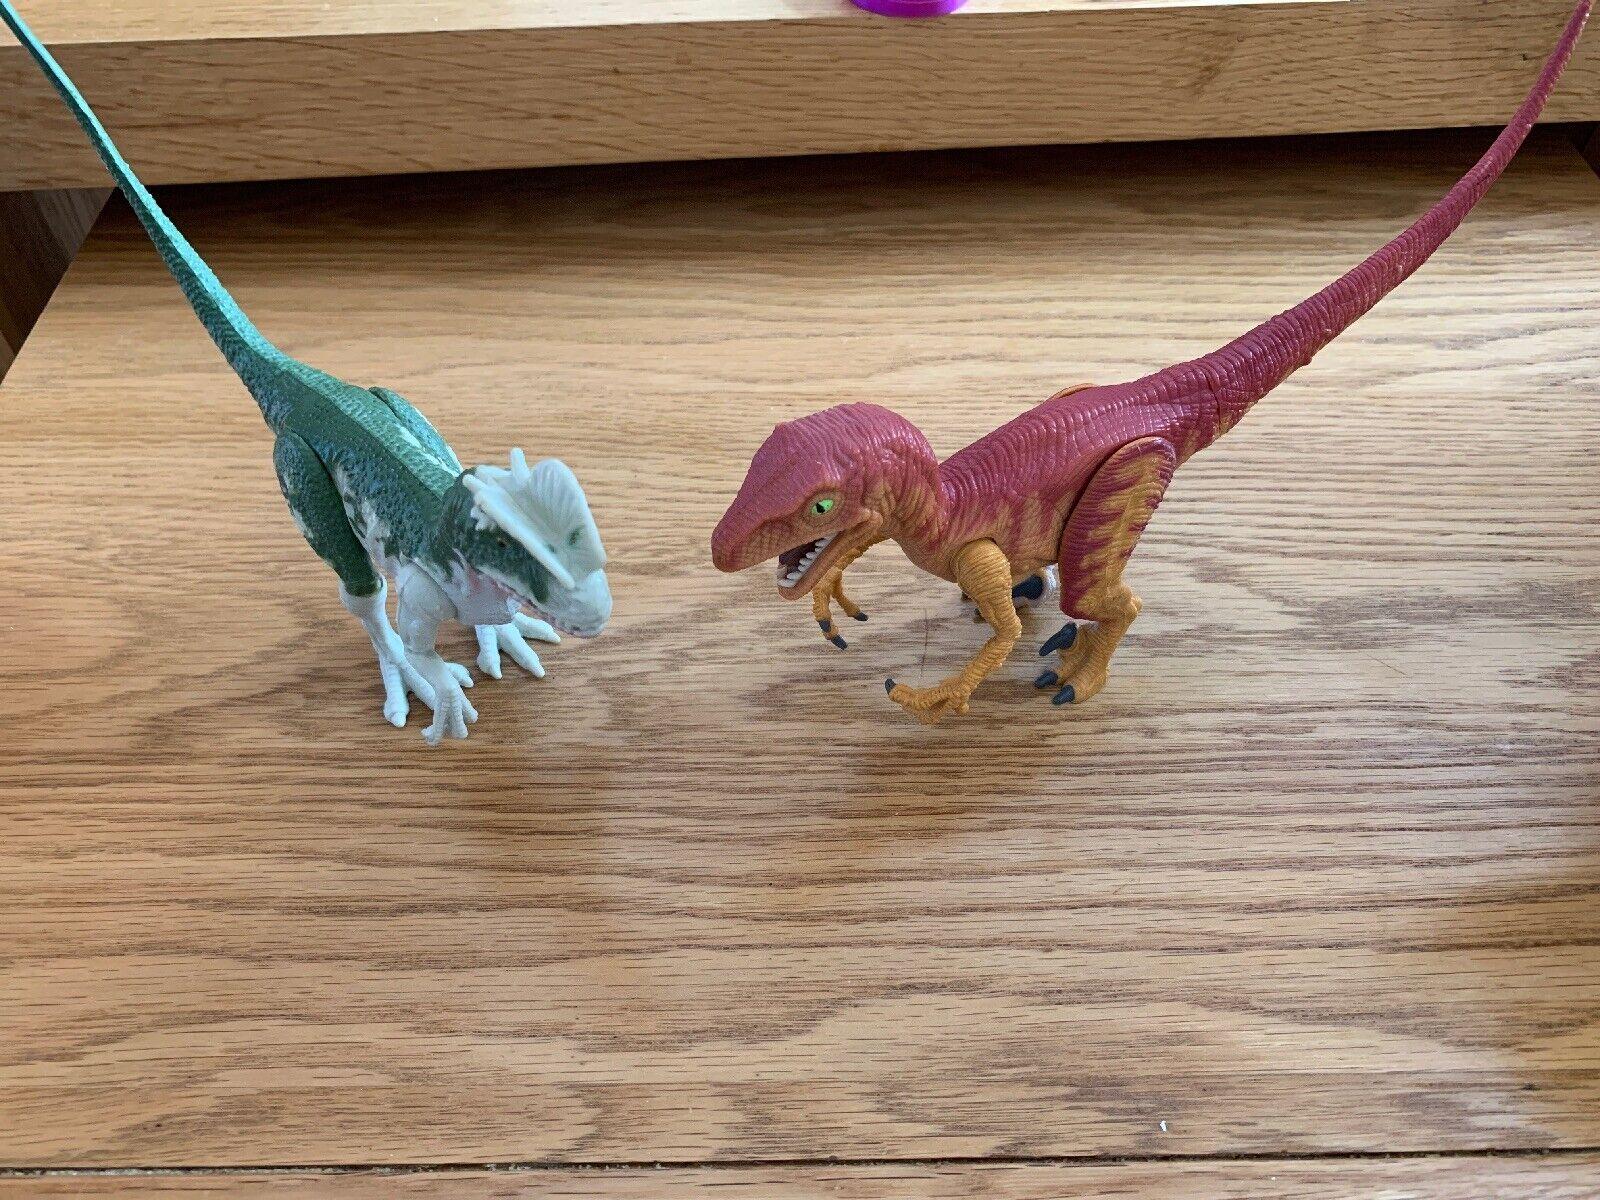 Jurassic Park Original Electronic Dilophosaurus And Velociraptor